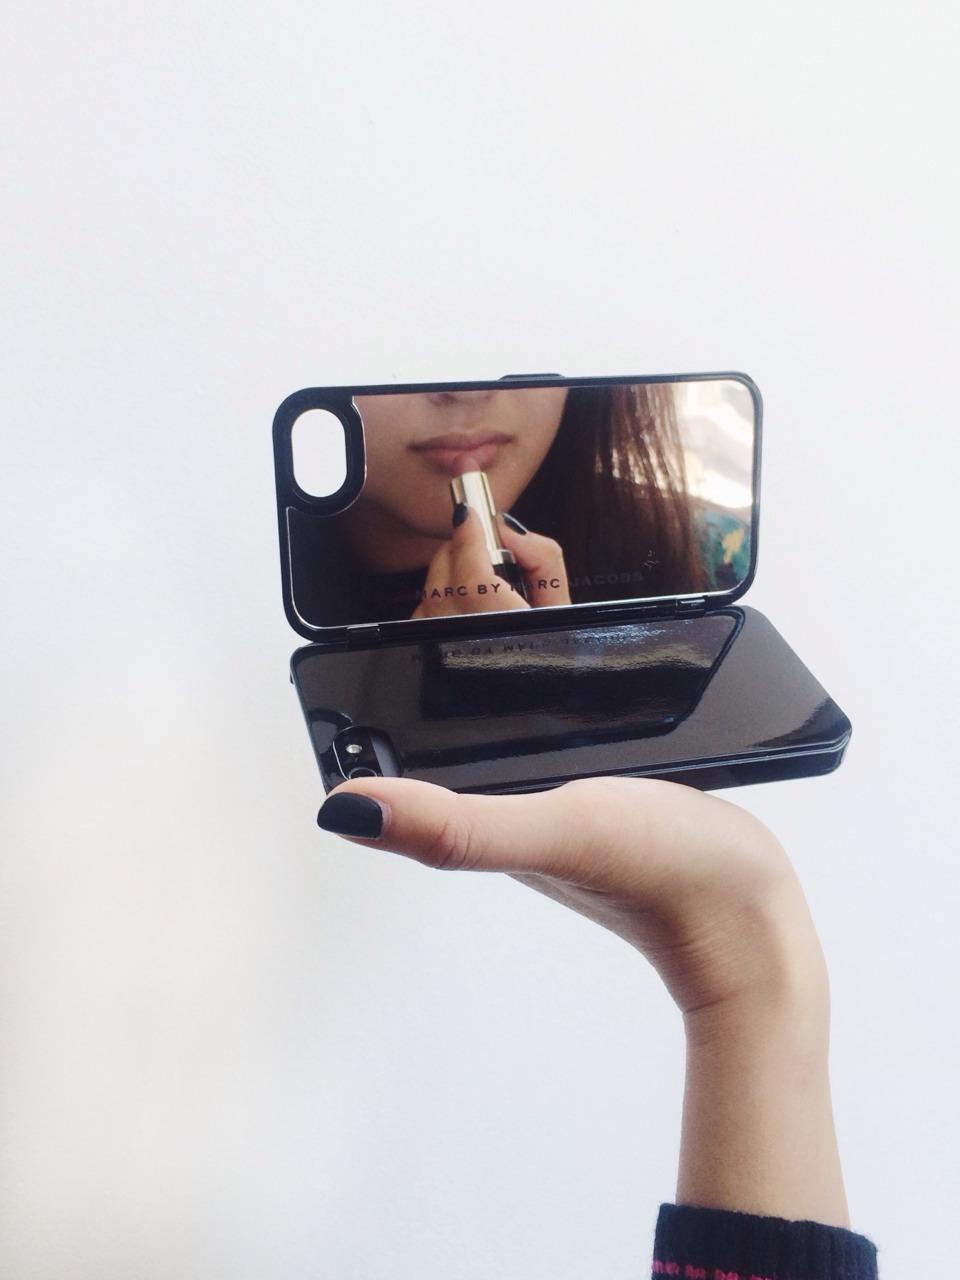 iPhone designer cell phone cases for iphone 5 : 30 Fundas para celular que toda mujer debe tener